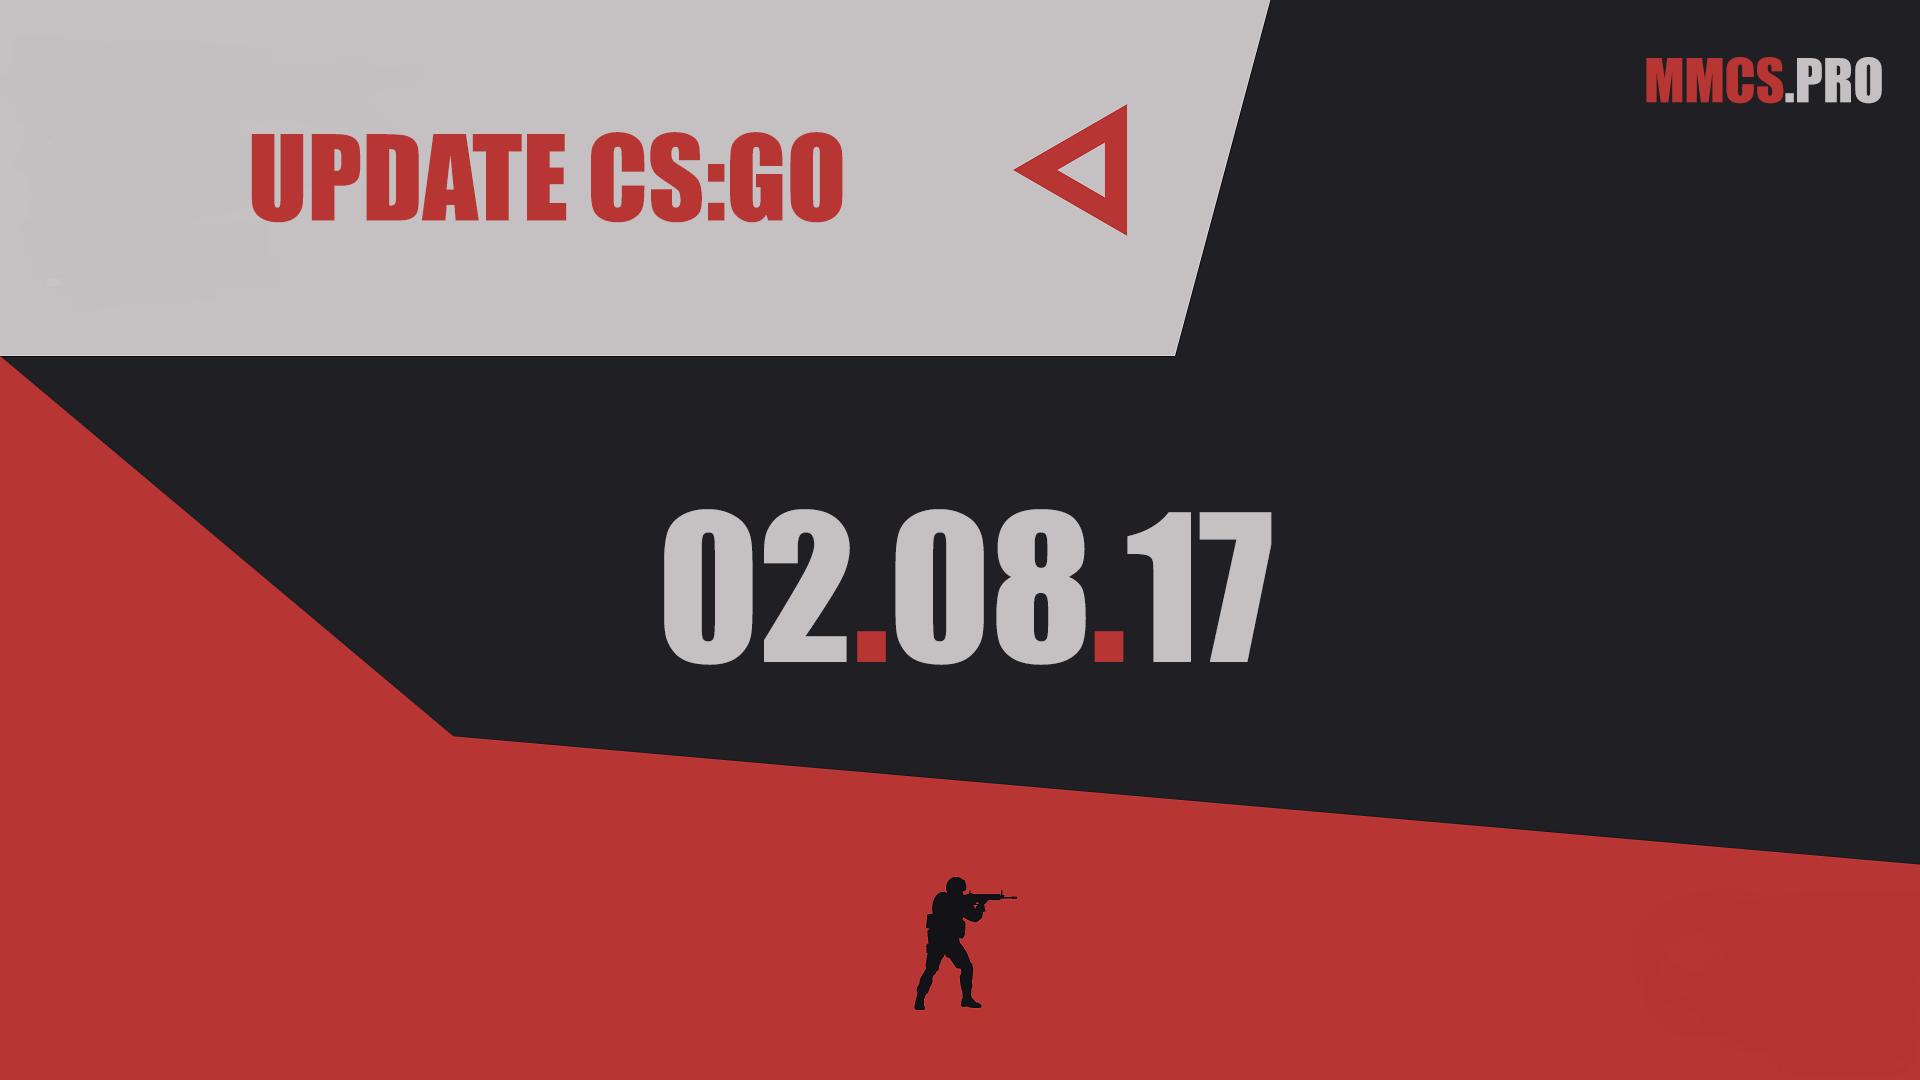 https://mmcs.pro/update-csgo-02-08-2017-valve/